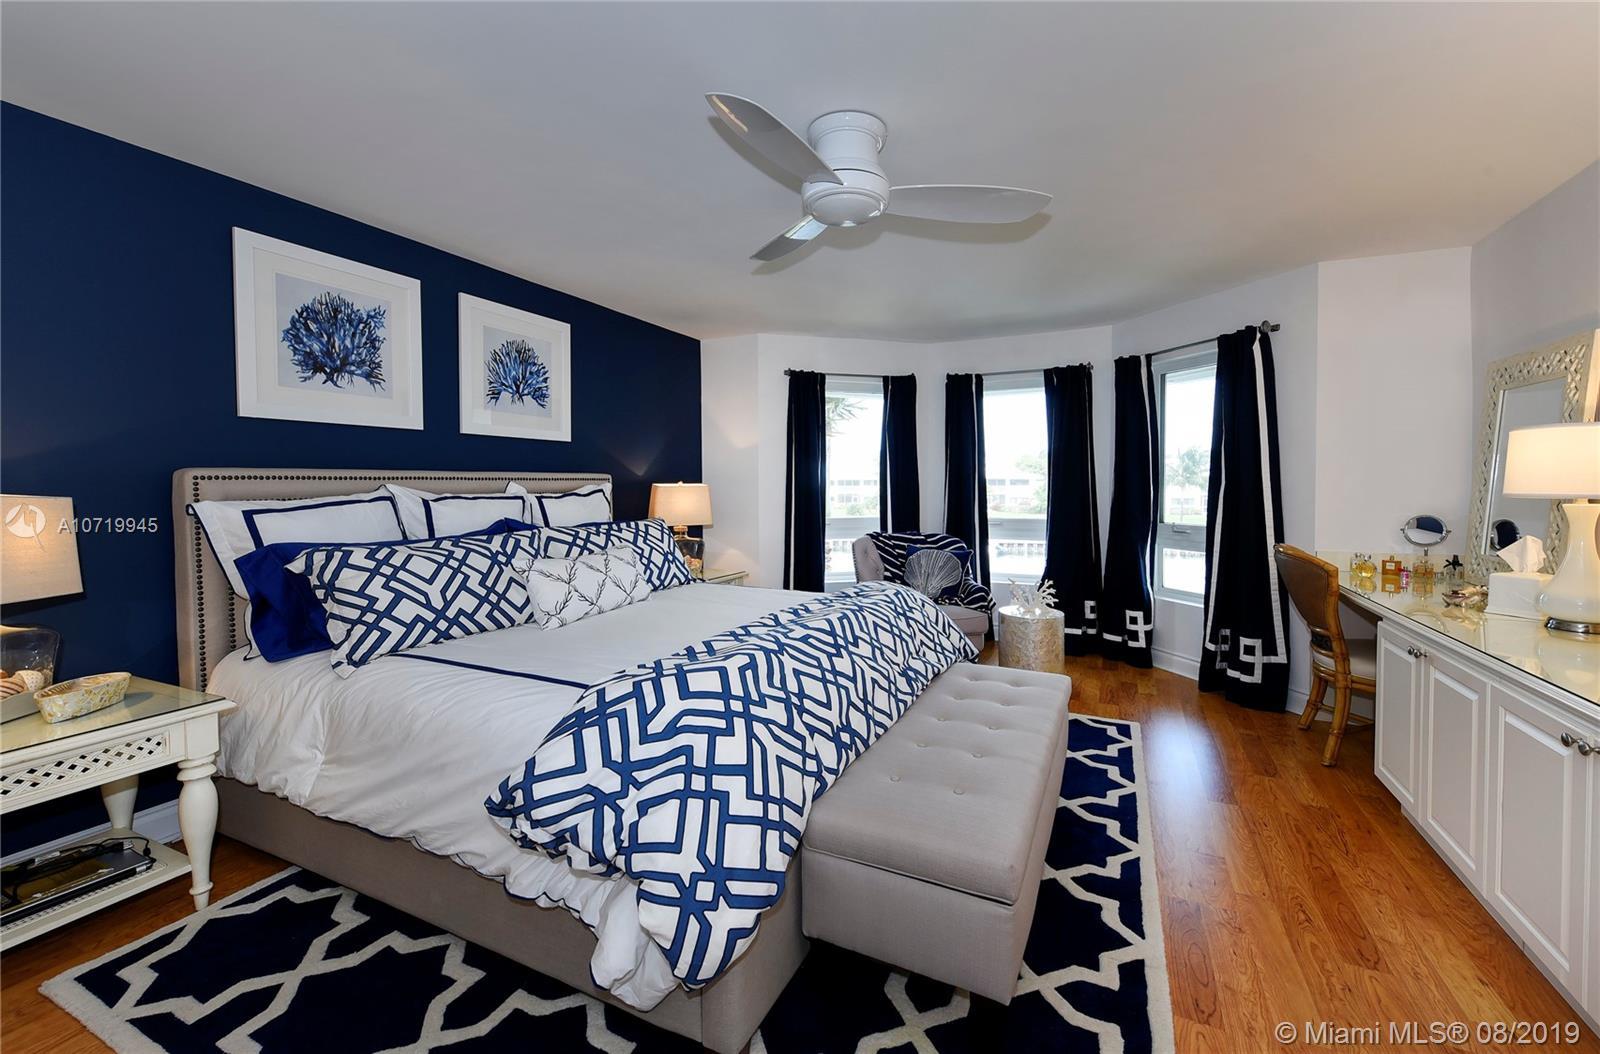 16 marlin Lane #B, Other City - Keys/Islands/Caribb, FL 33037 - Other City - Keys/Islands/Caribb, FL real estate listing